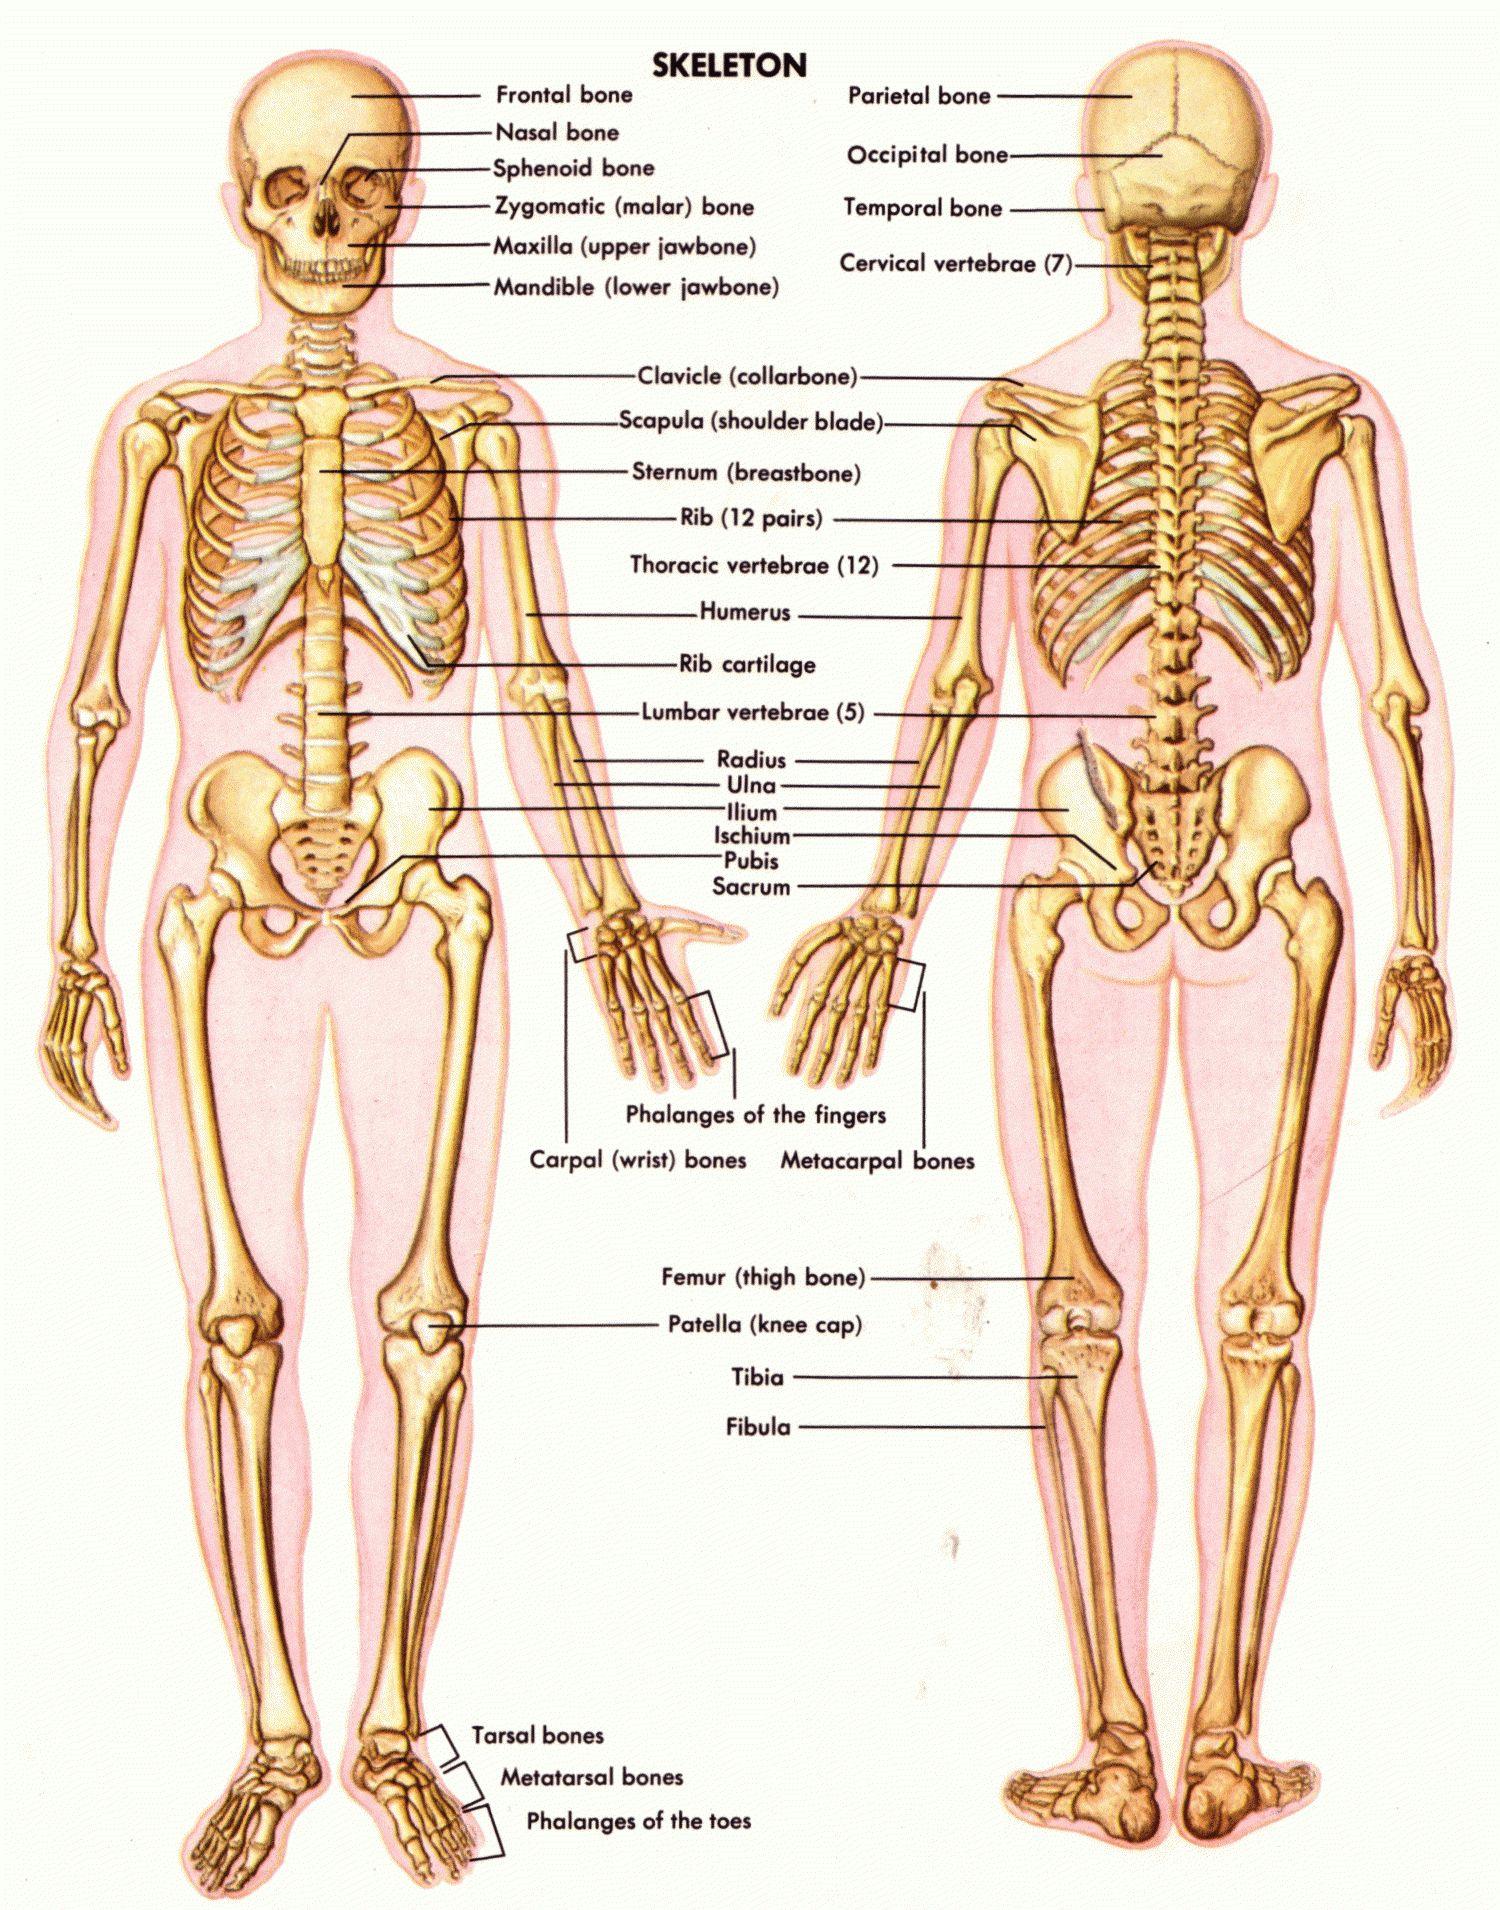 anatomy male groin anatomy male groin skeletal grion area male groin bones diagram [ 1500 x 1910 Pixel ]